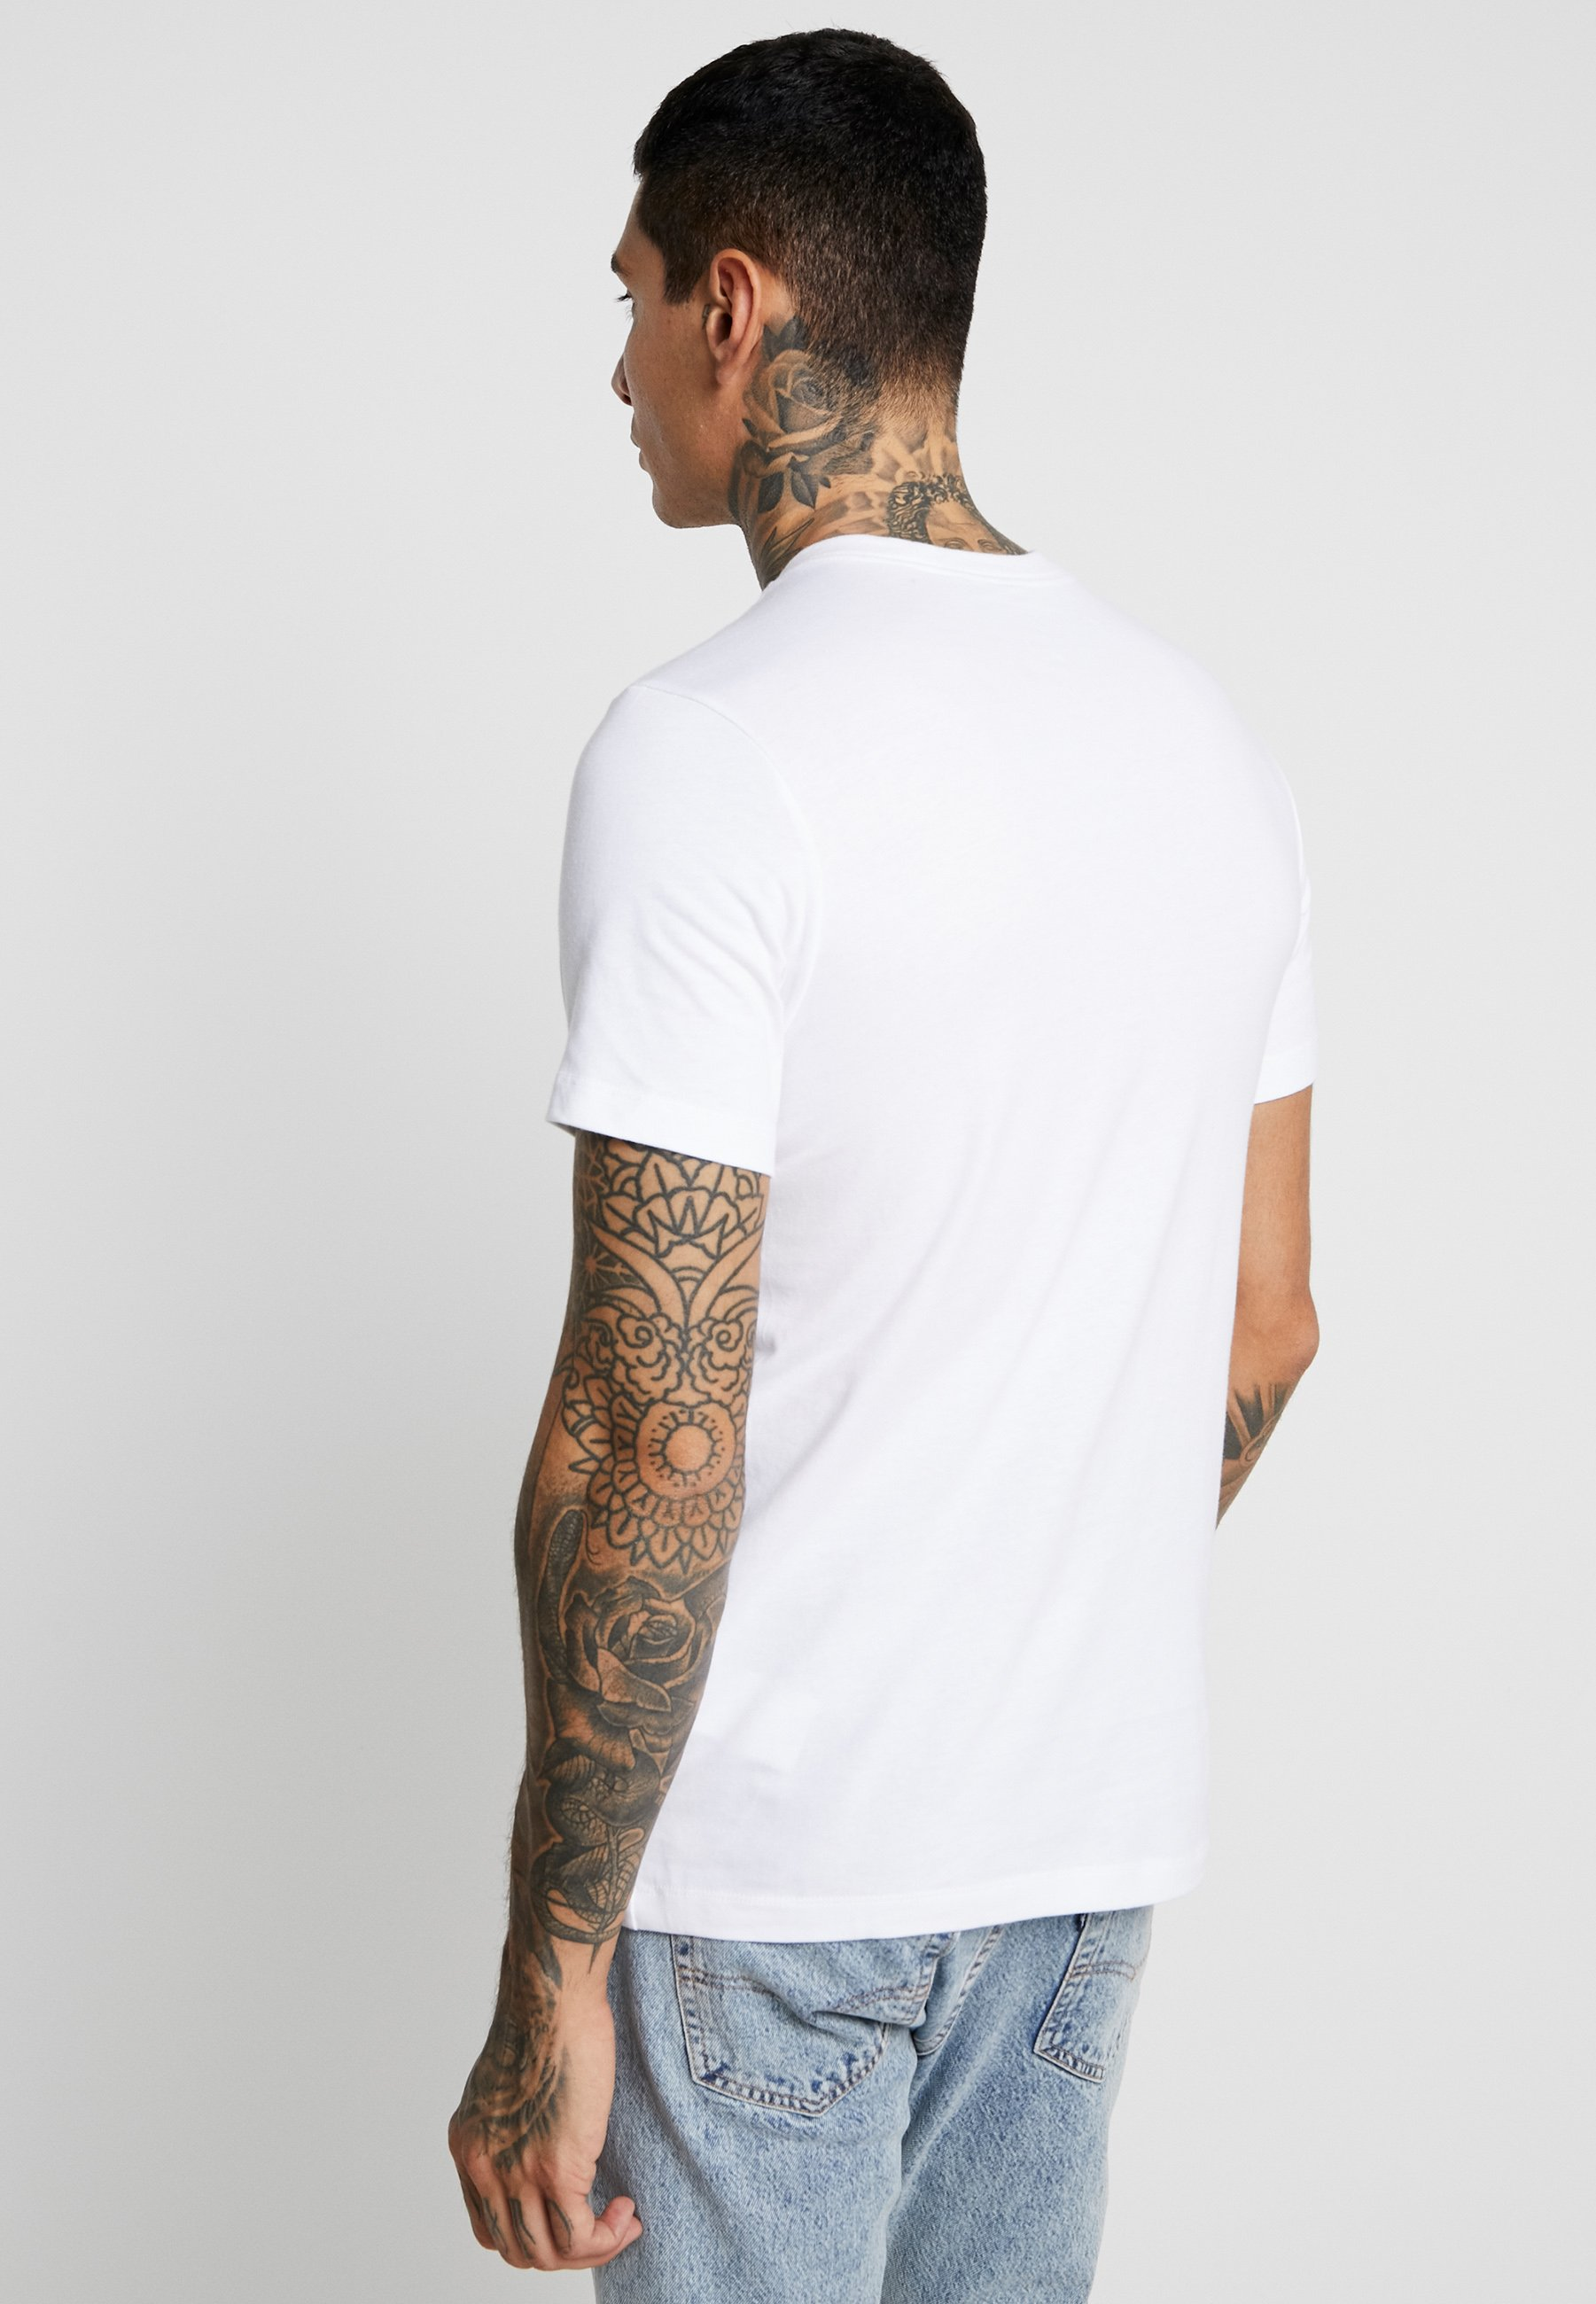 Nike TeeT shirt White Sportswear Imprimé m80nNwvO